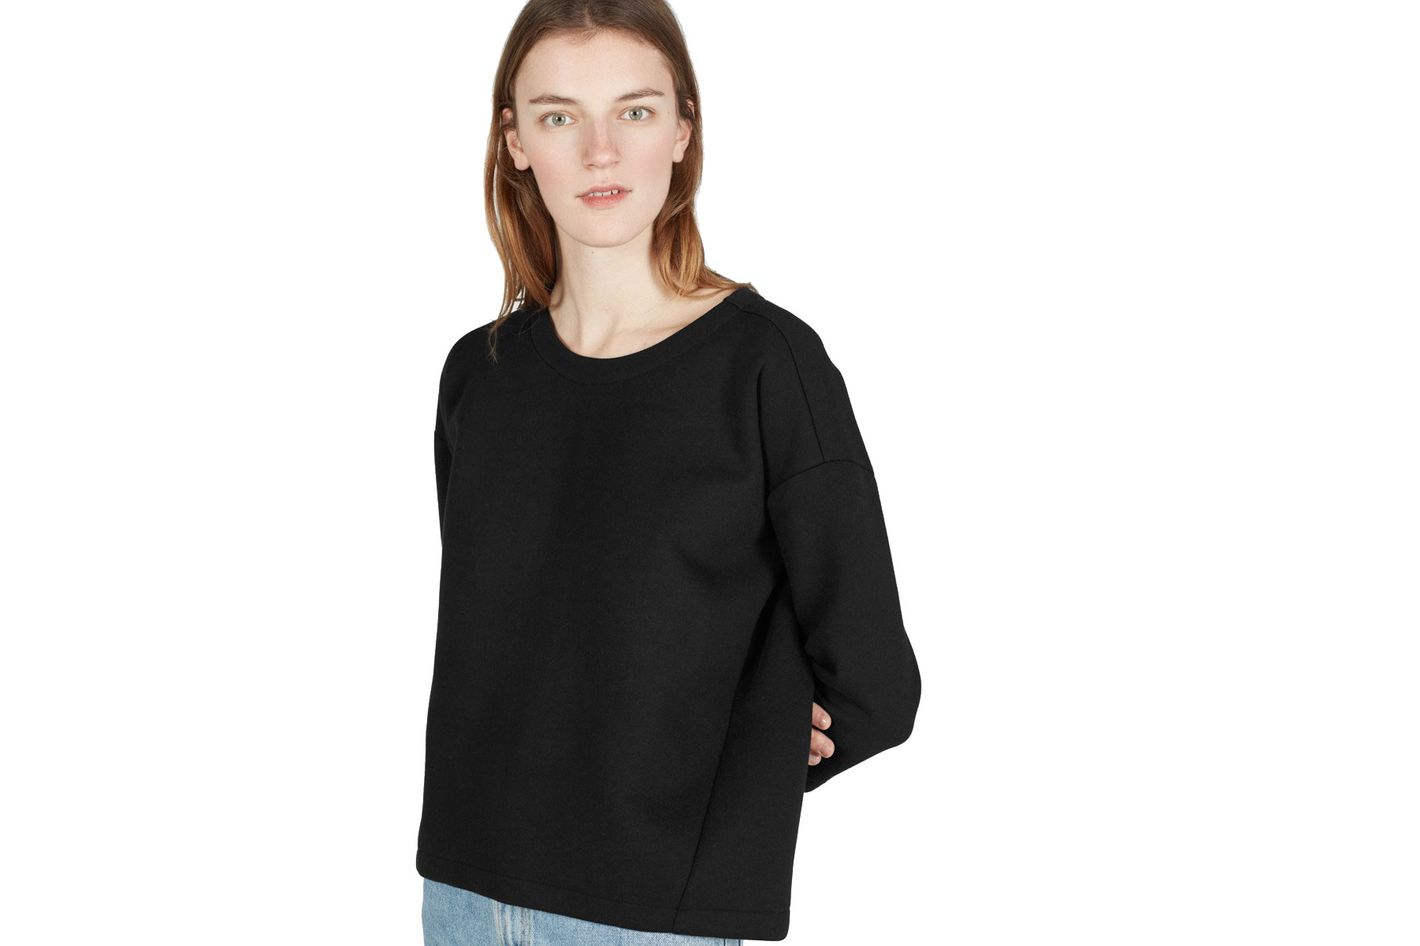 Everlane Women's Street Fleece Sweatshirt